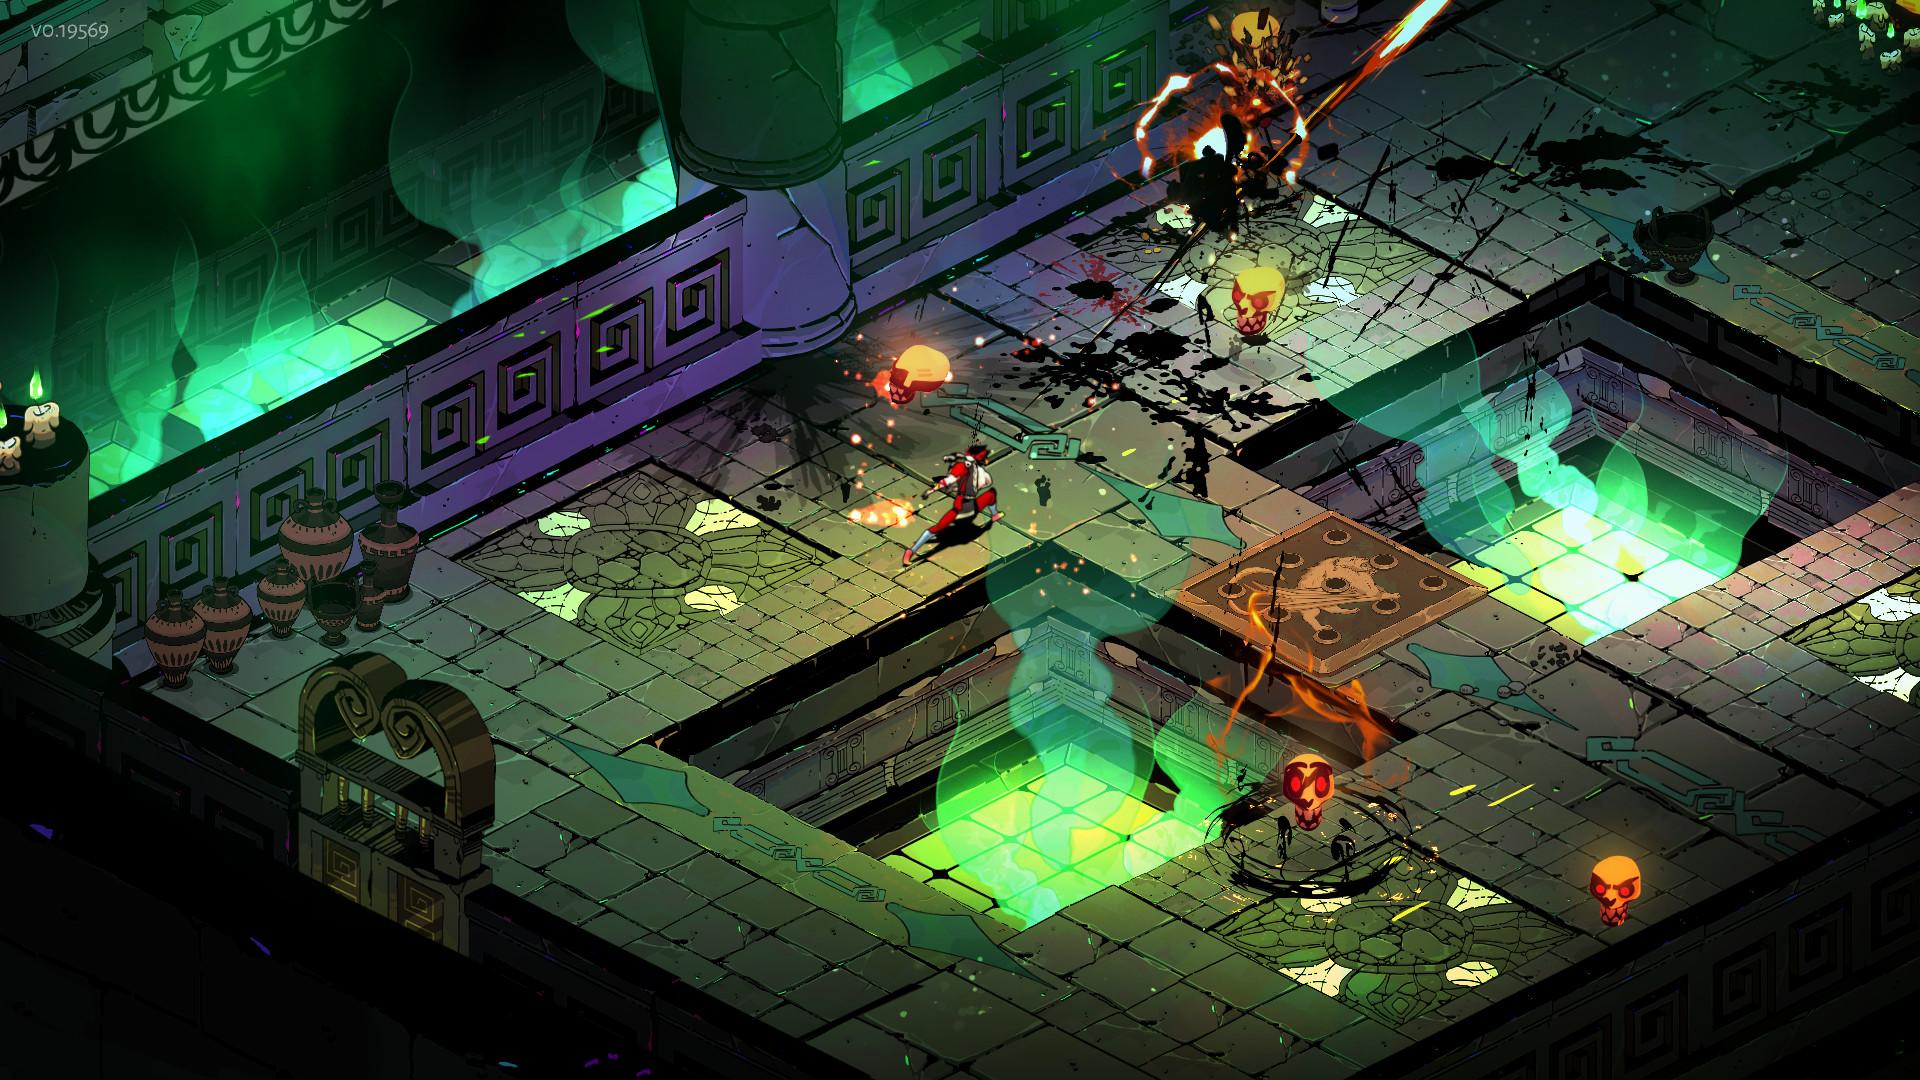 Hades - Best Action Games 2020